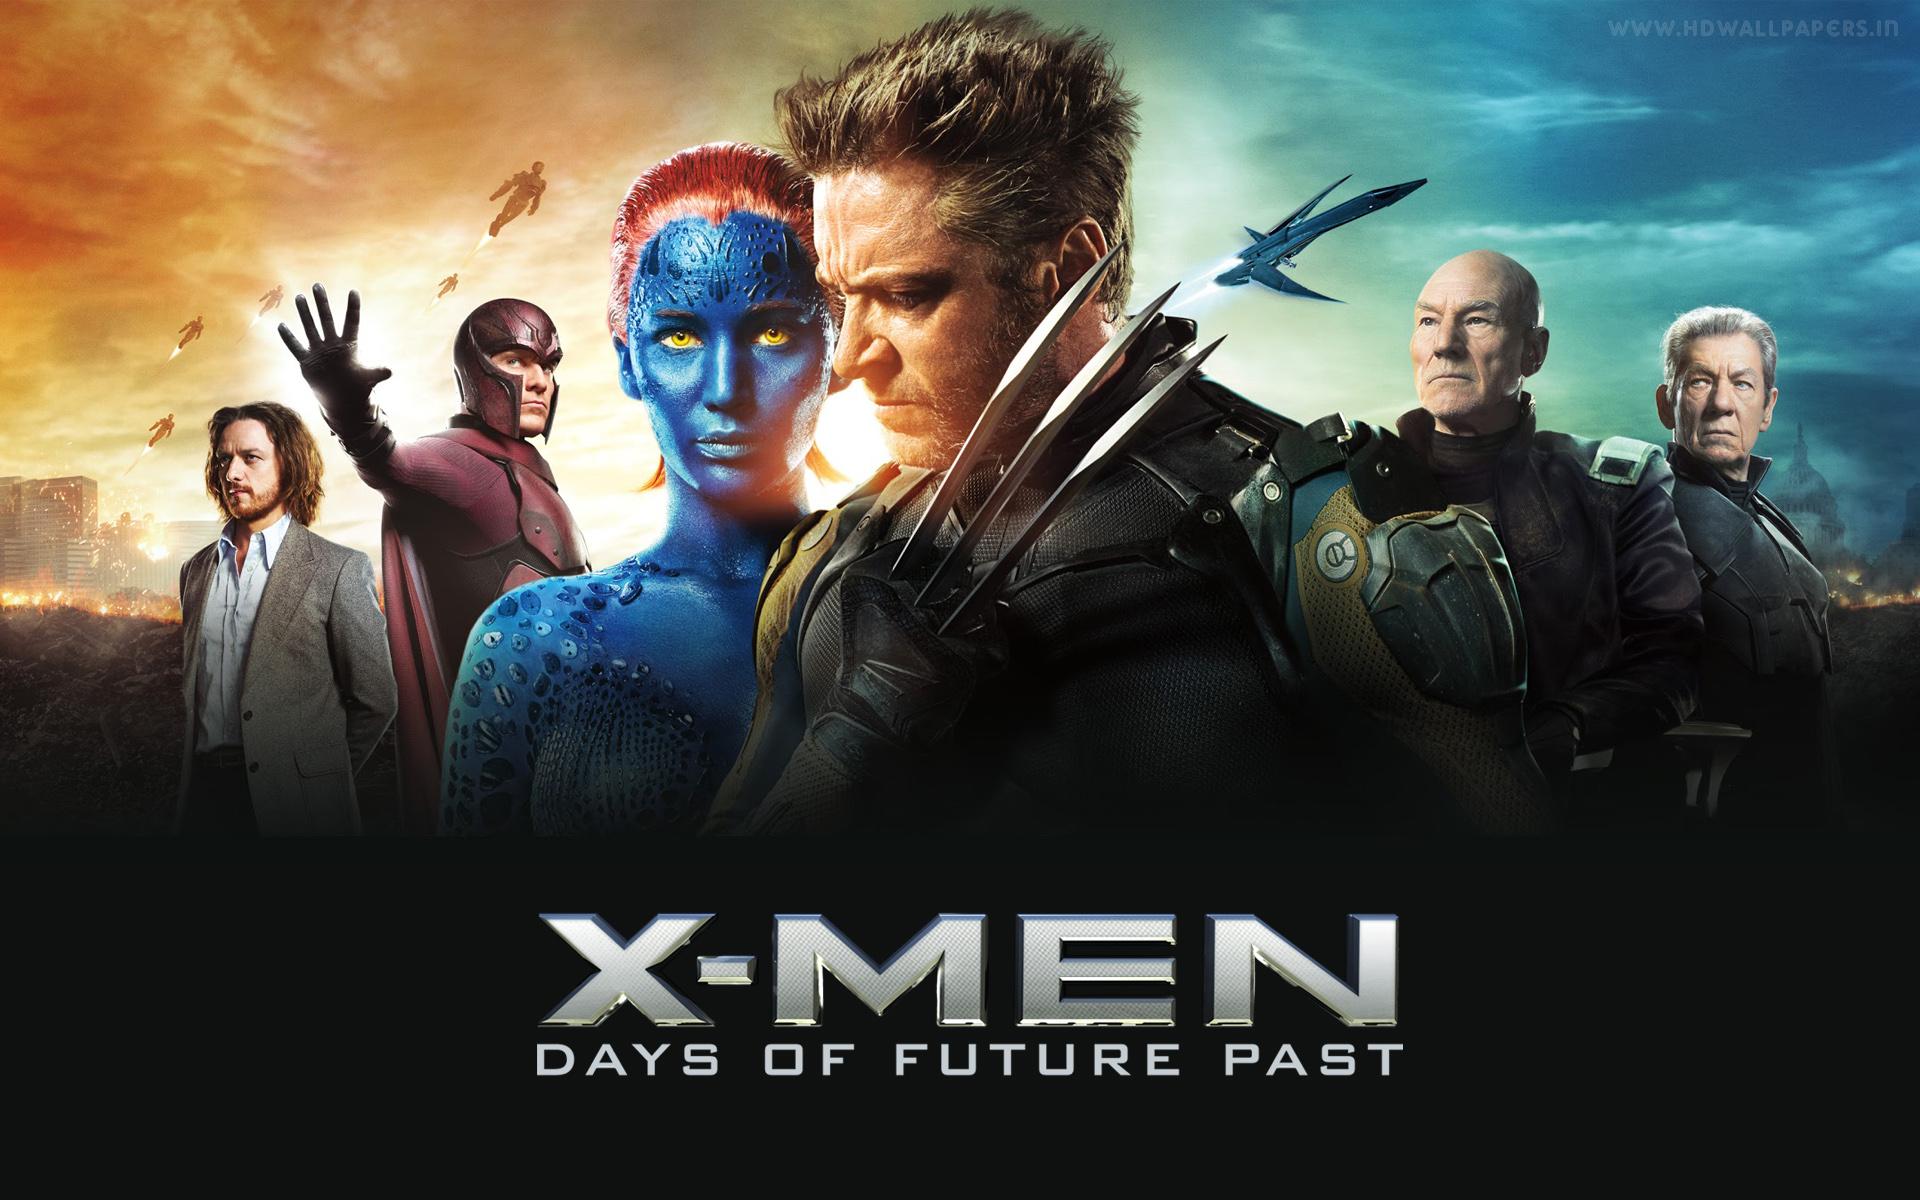 'X-Men: Days of Future Past' Banner Art